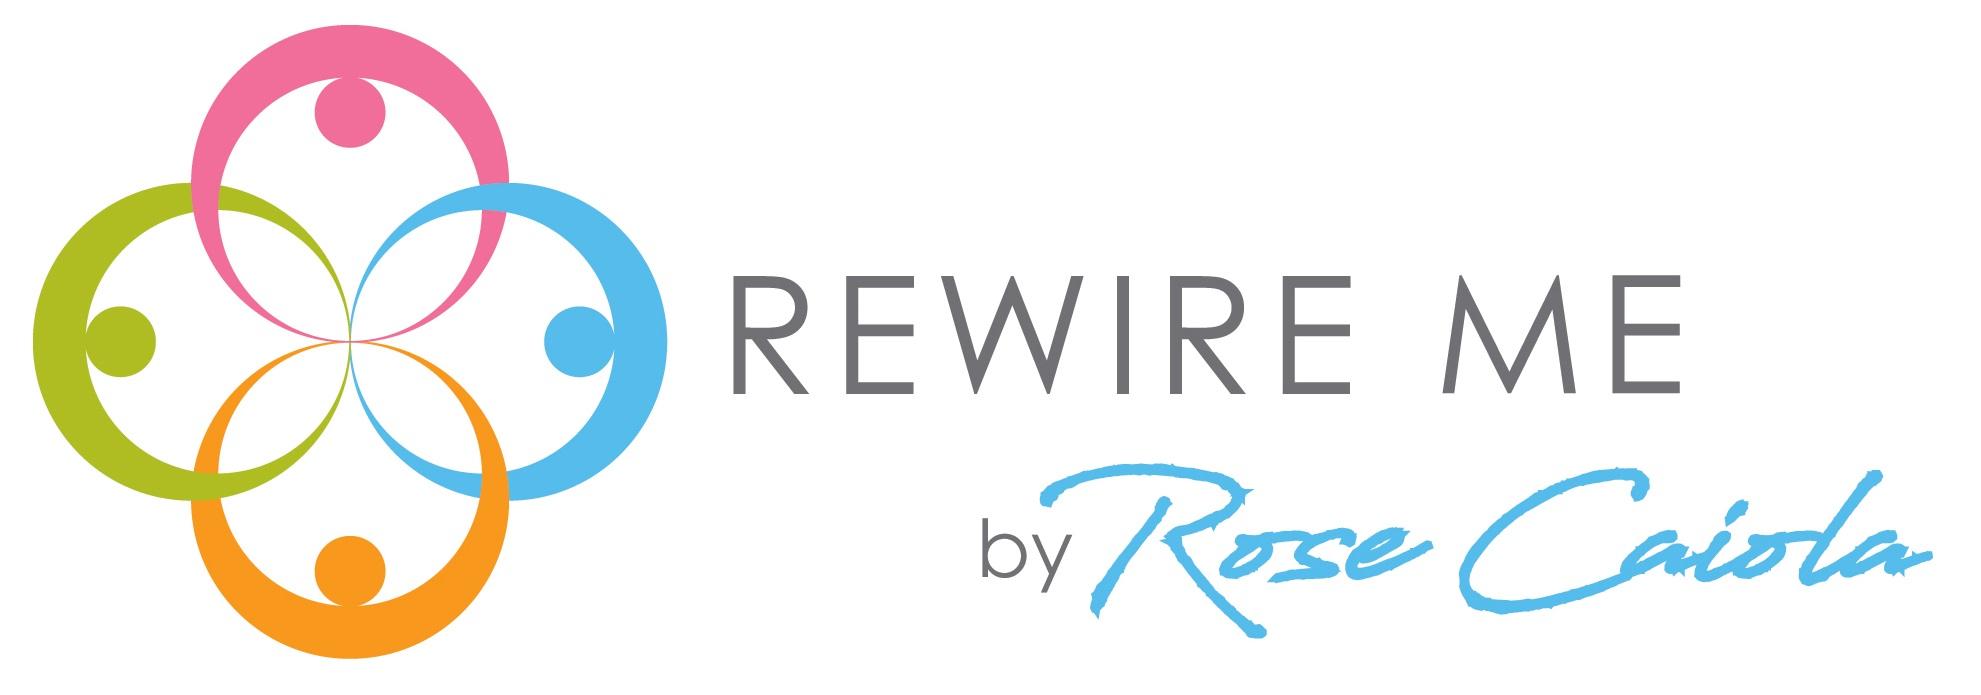 Rewire Me by Rose Caiola Logo